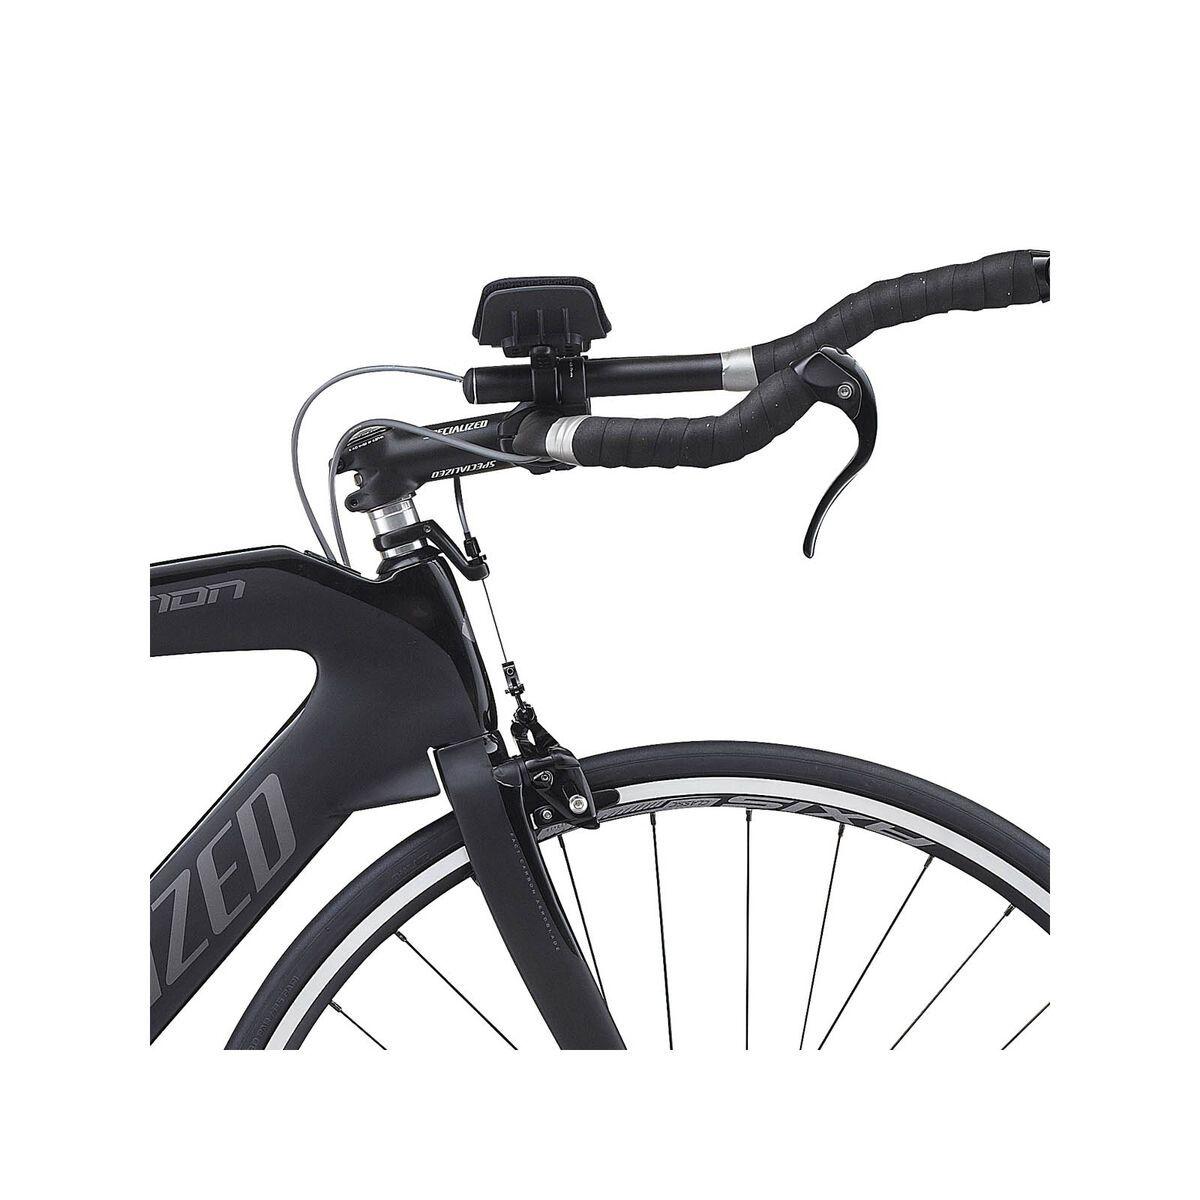 Specialized Transition Sport 105 C2, Carbon/Charcoal   Bild 5